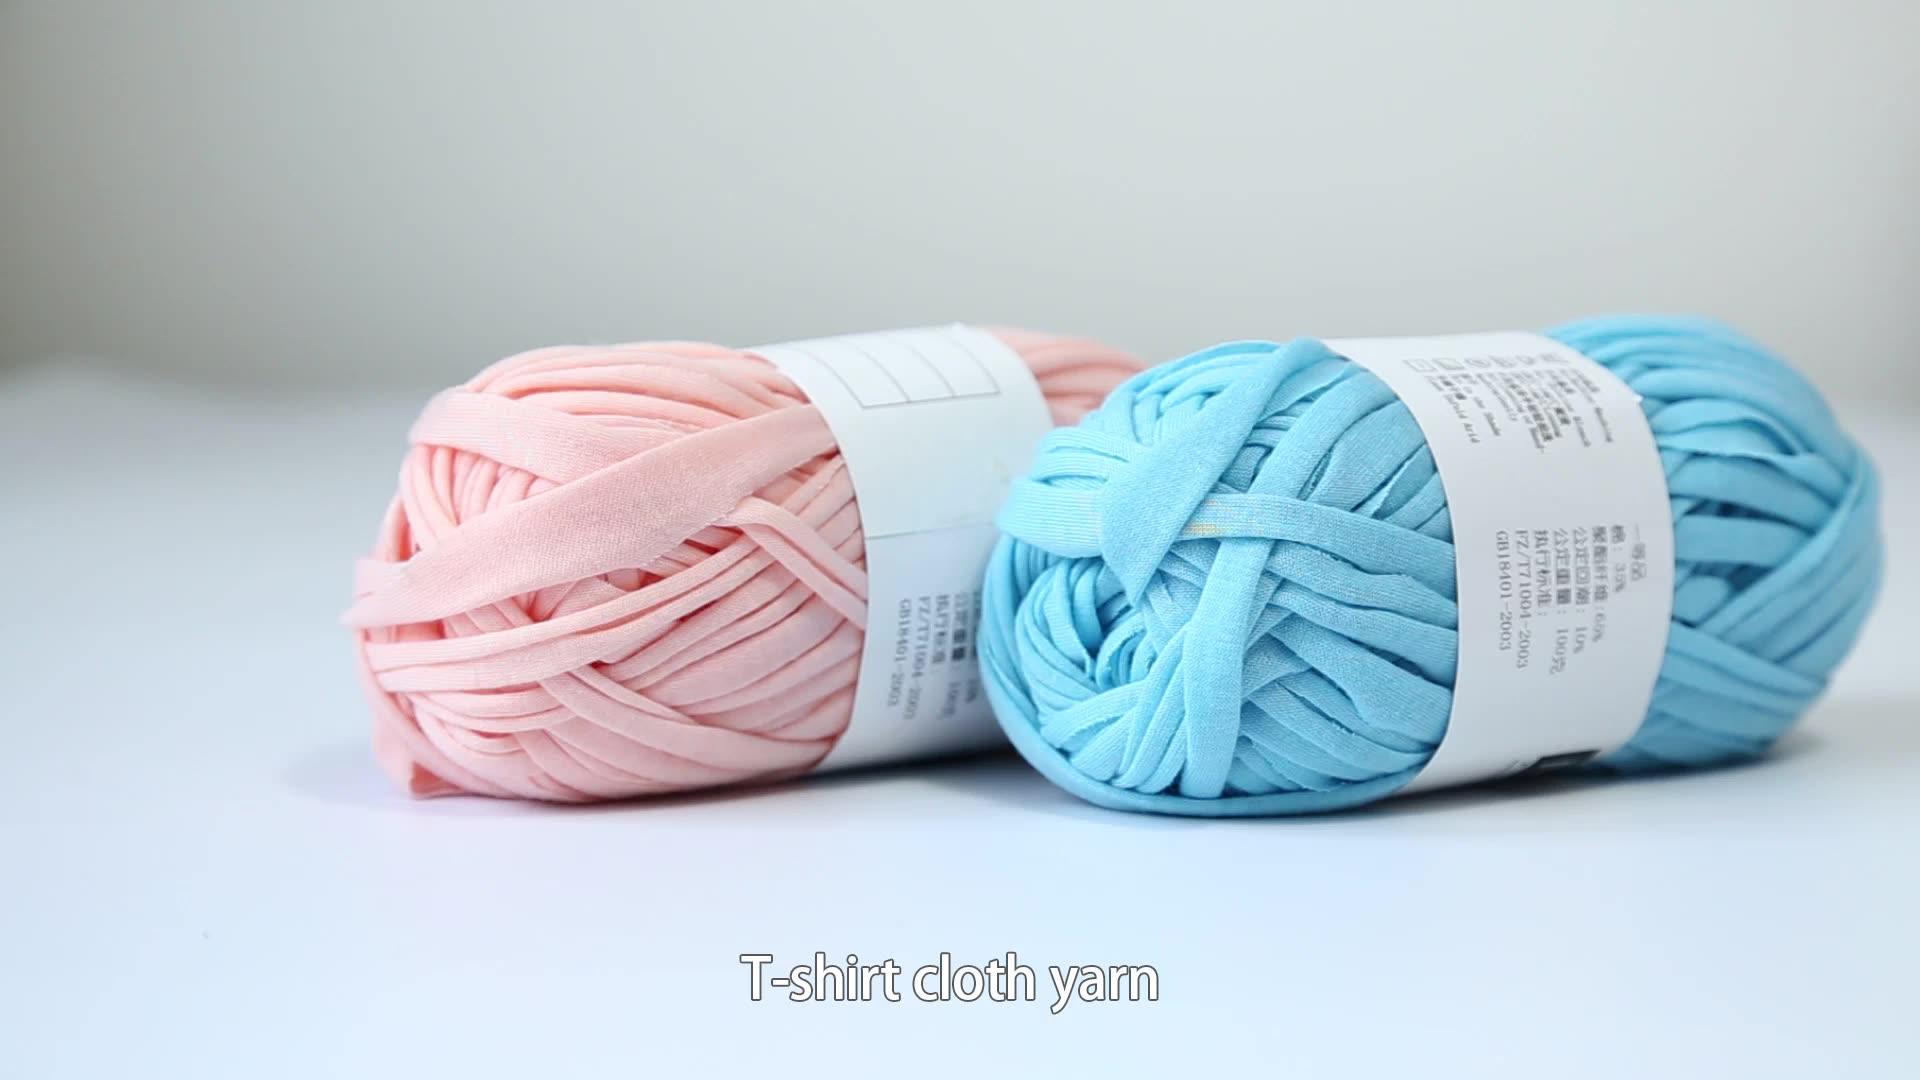 Super fashion elastic t shirt yarn for crochet sweater